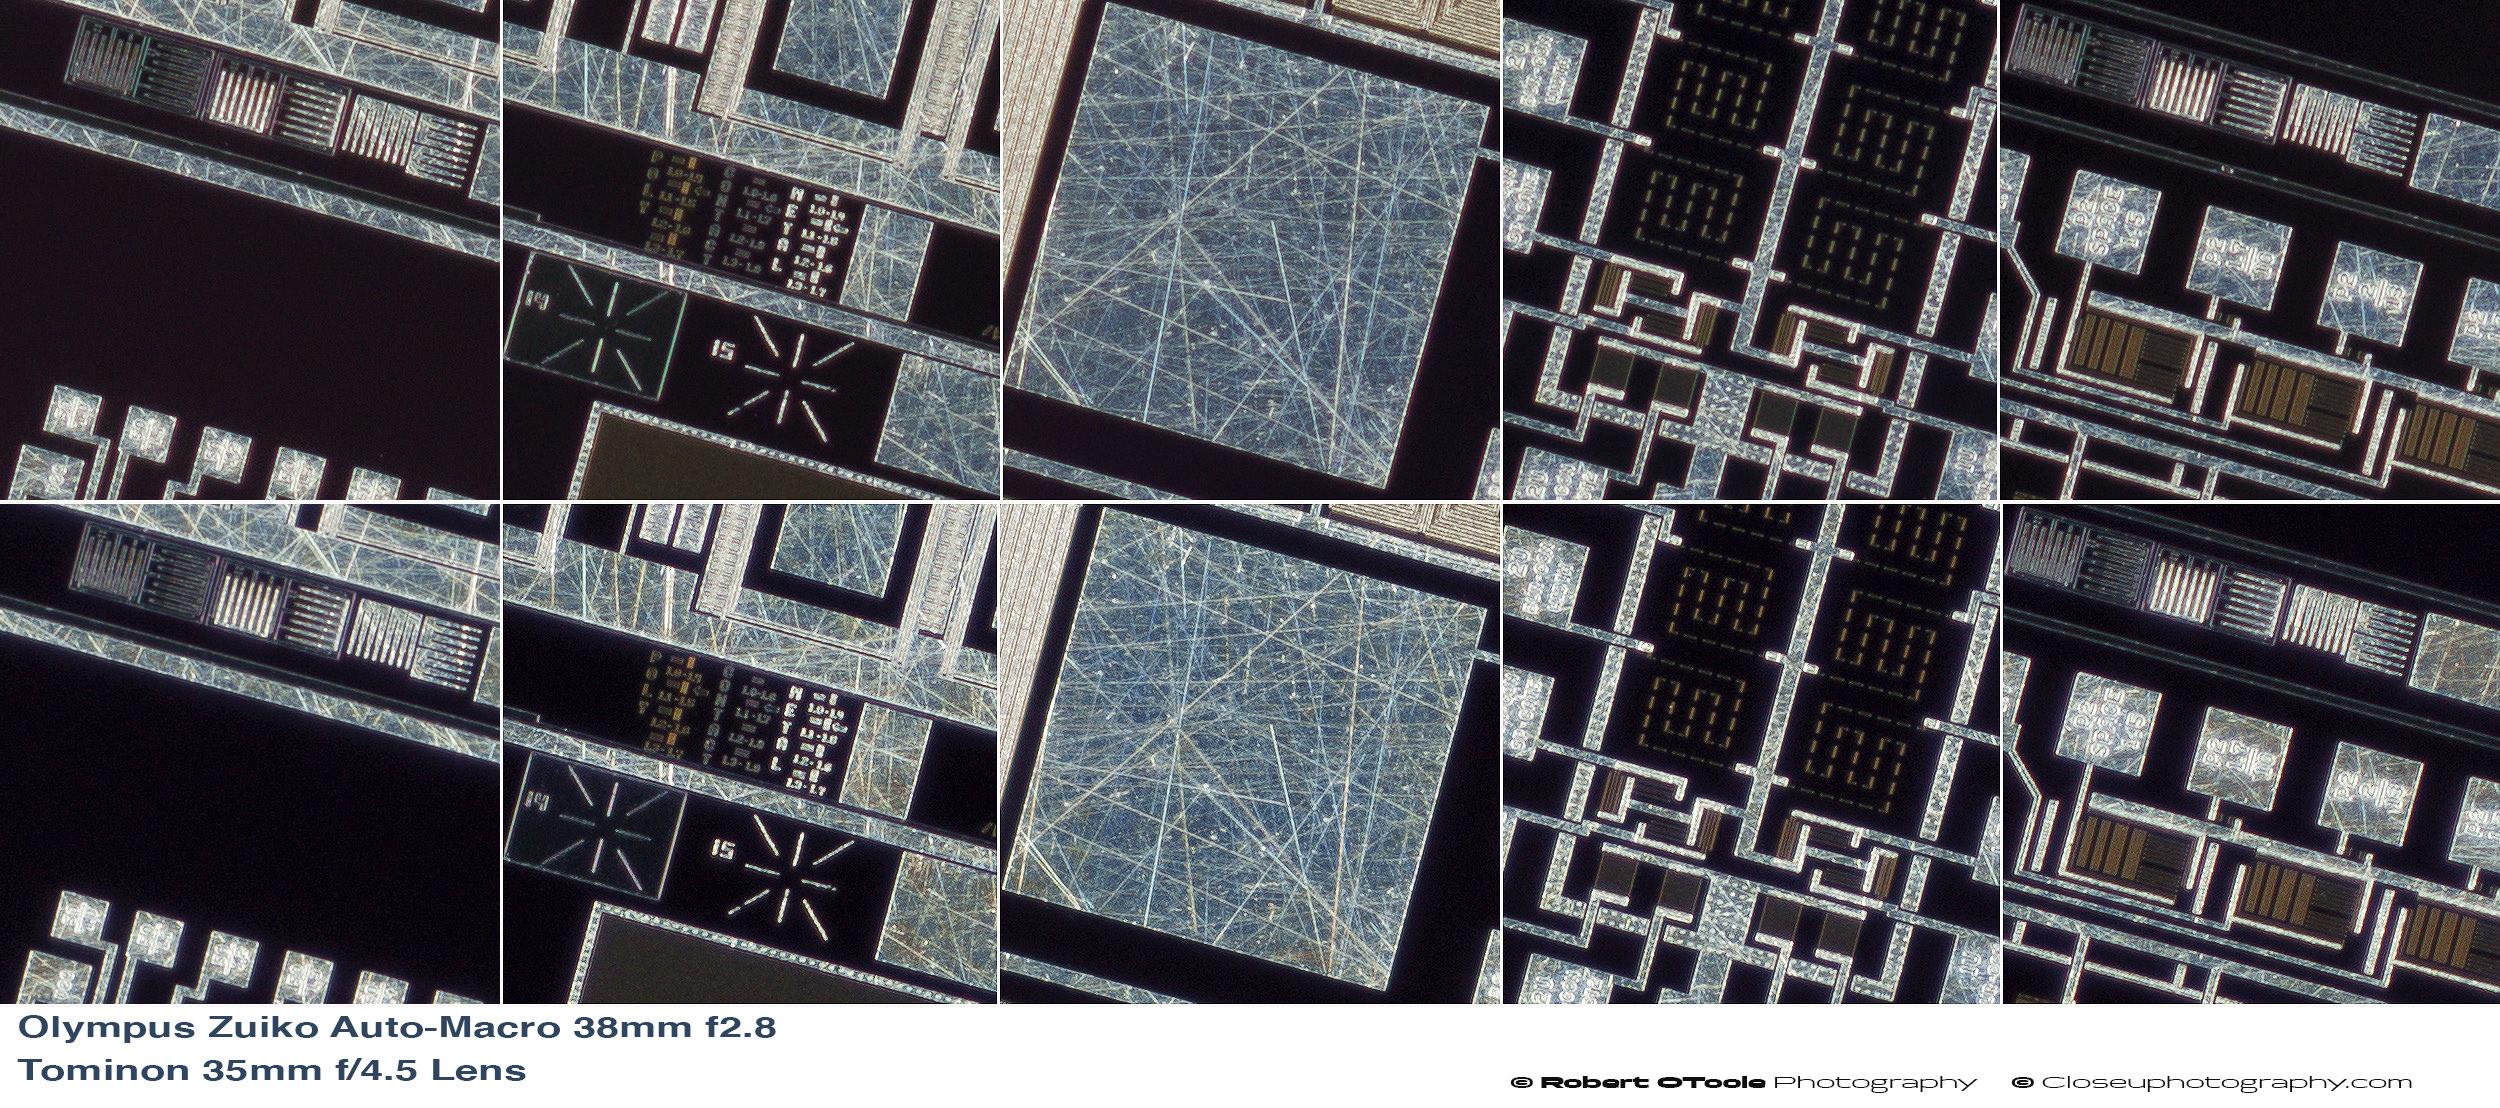 Olympus-Zuiko-Auto-Macro-38mm-f2.8-vs-Tominon-35mm-f4.5-Lens-100-percent-crops.jpg